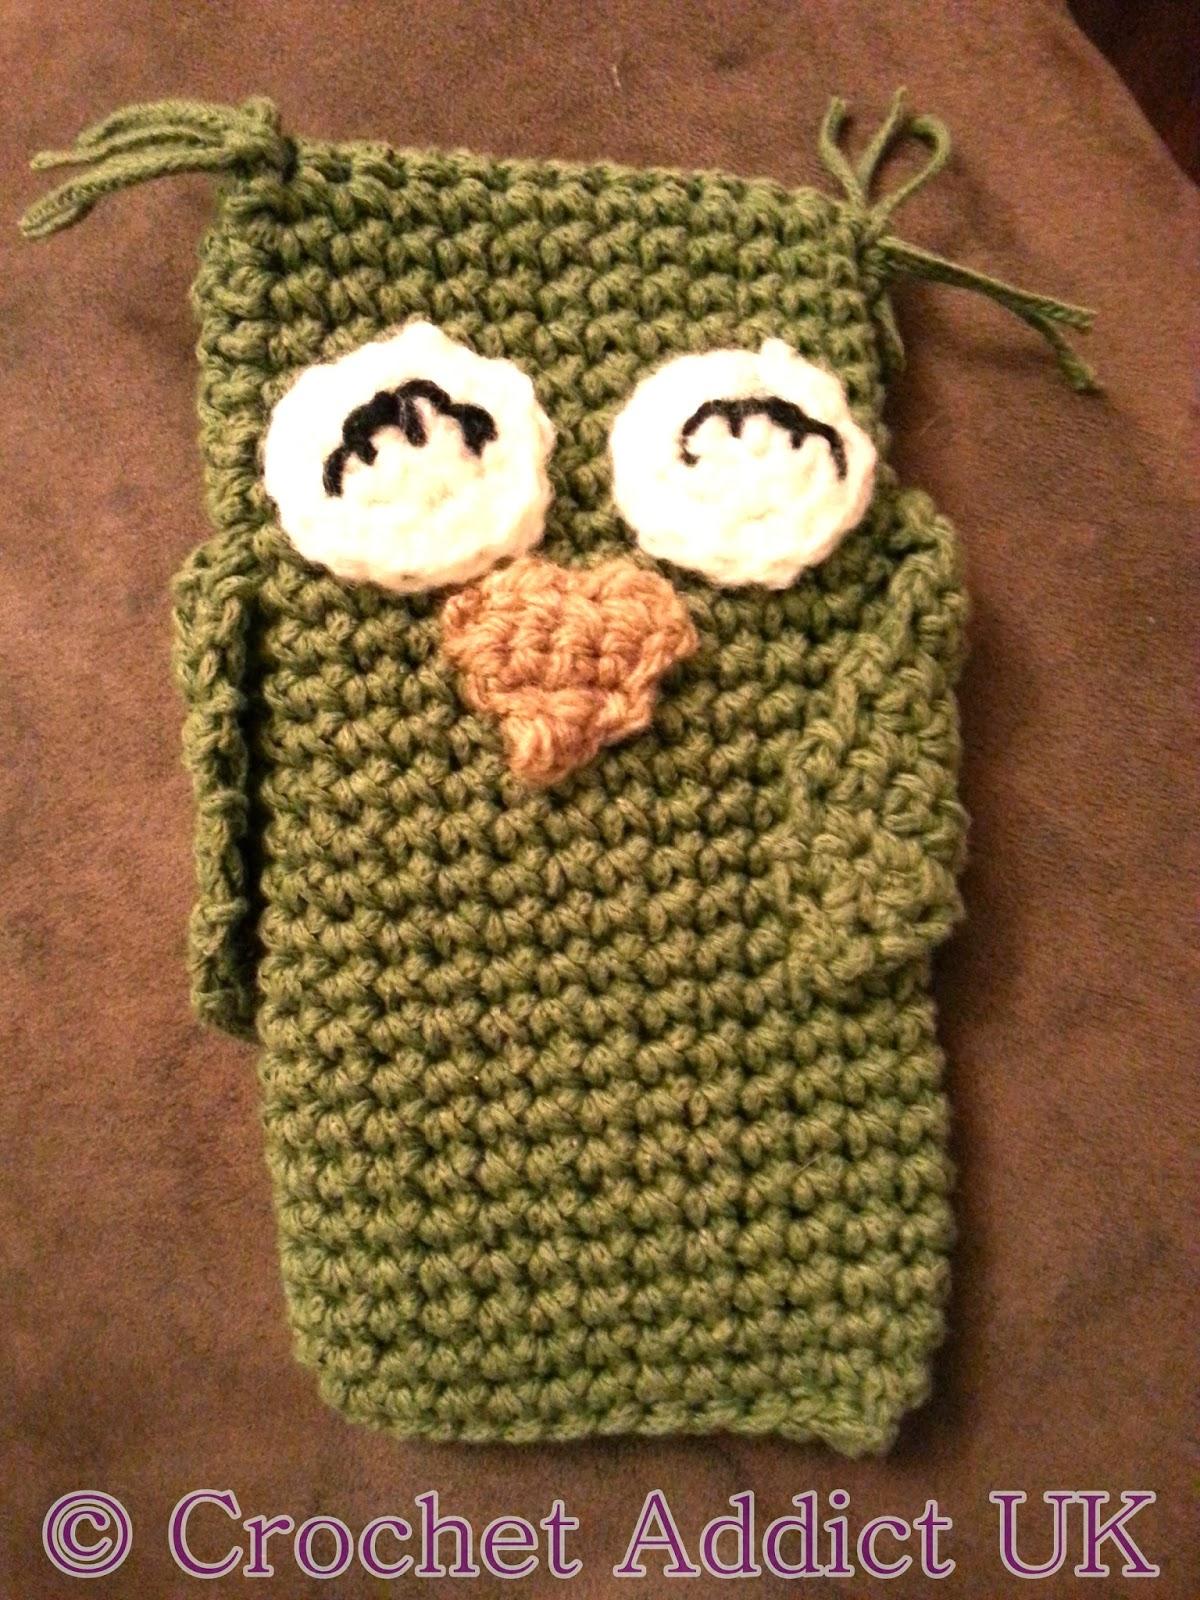 Free Crochet Pattern - Owl Phone Cozy ~ Crochet Addict UK